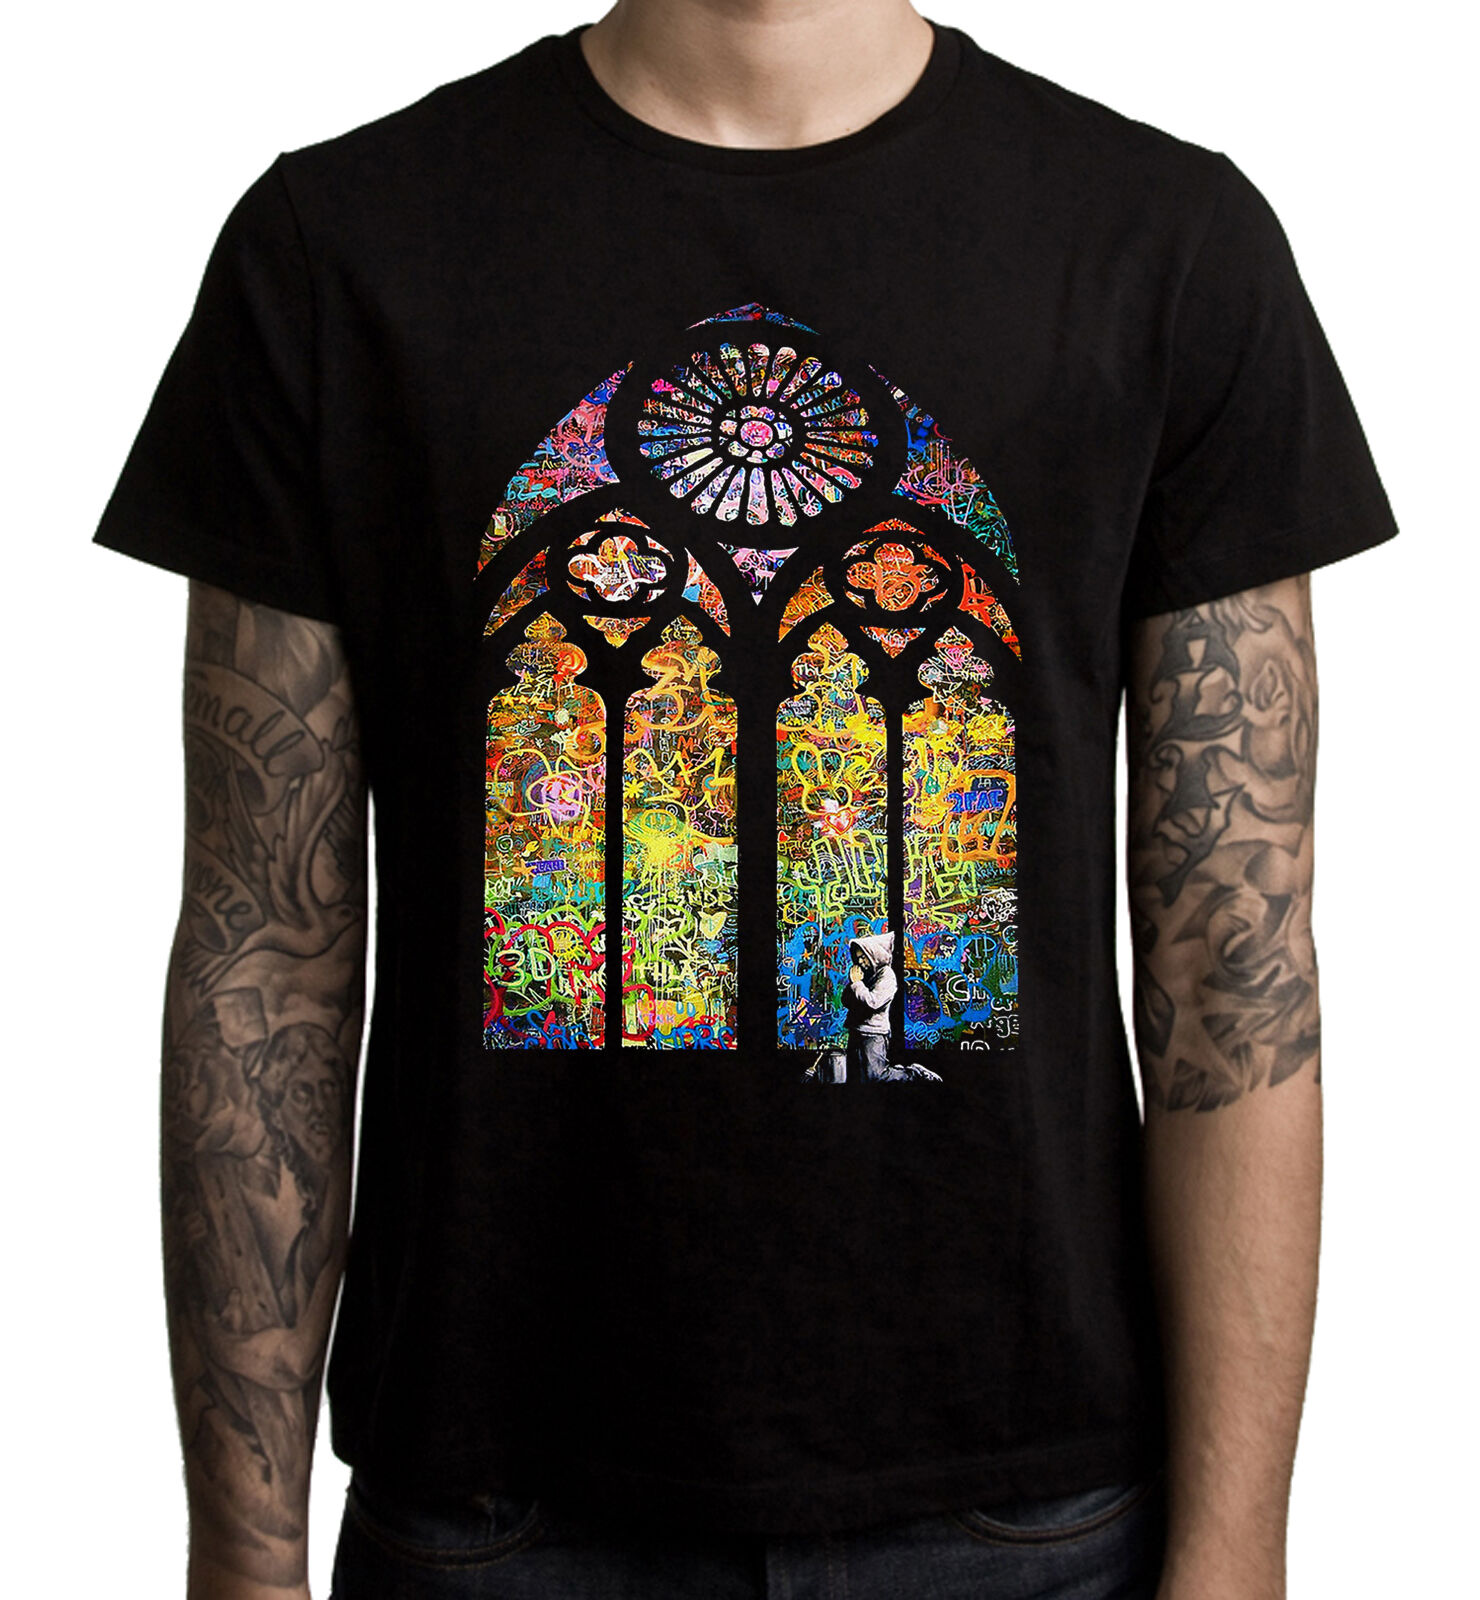 Banksy Panda Baseball T-Shirt Herren S-3XL Urban Graffiti Cool Mode T-Shirt Top